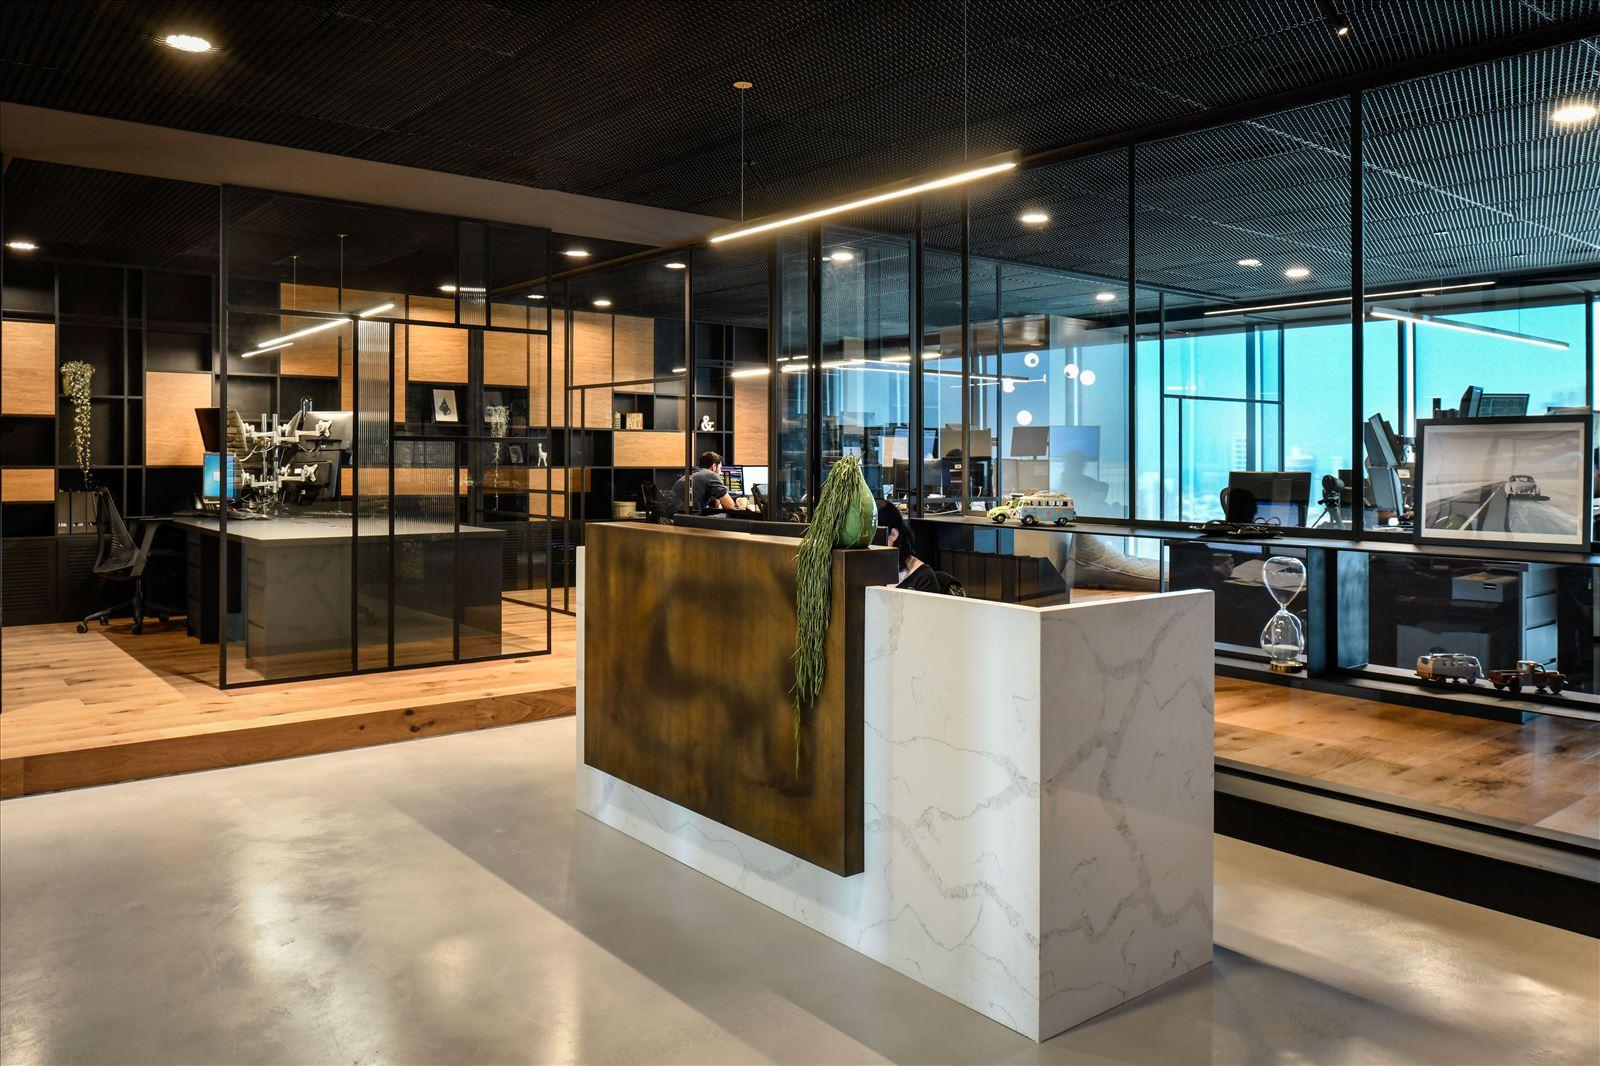 Arbitrage office עיצוב מיוחד של גופי תאורה במרחב המשרד בתכנון דורי קמחי